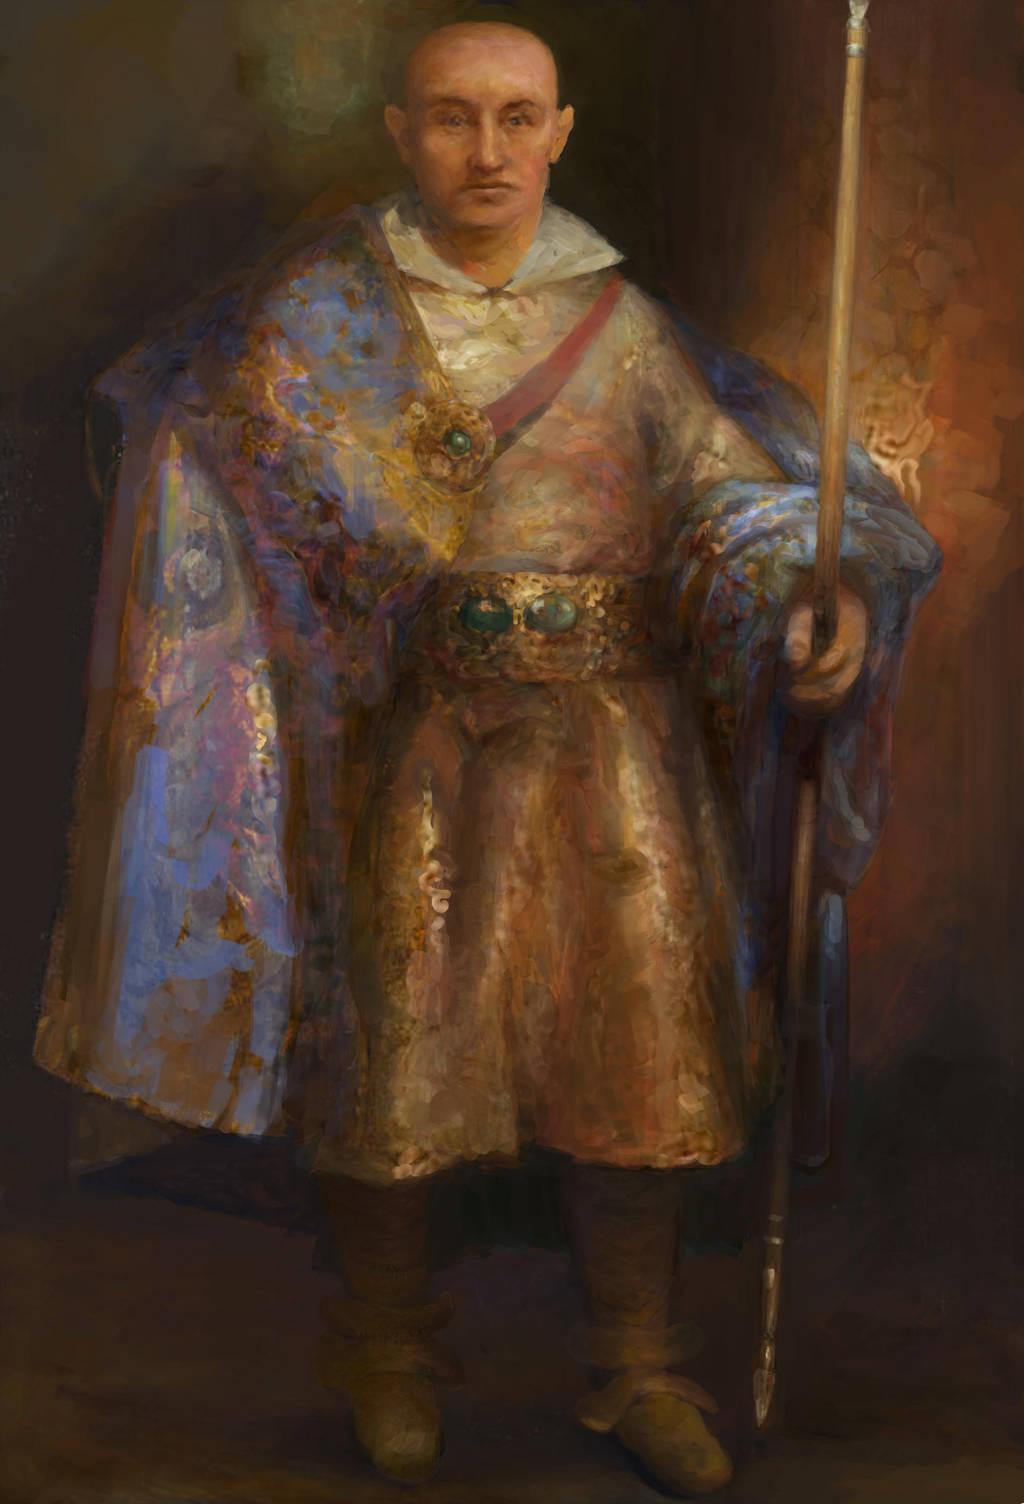 Morrowind: Trebonius Artorius by IgorLevchenko